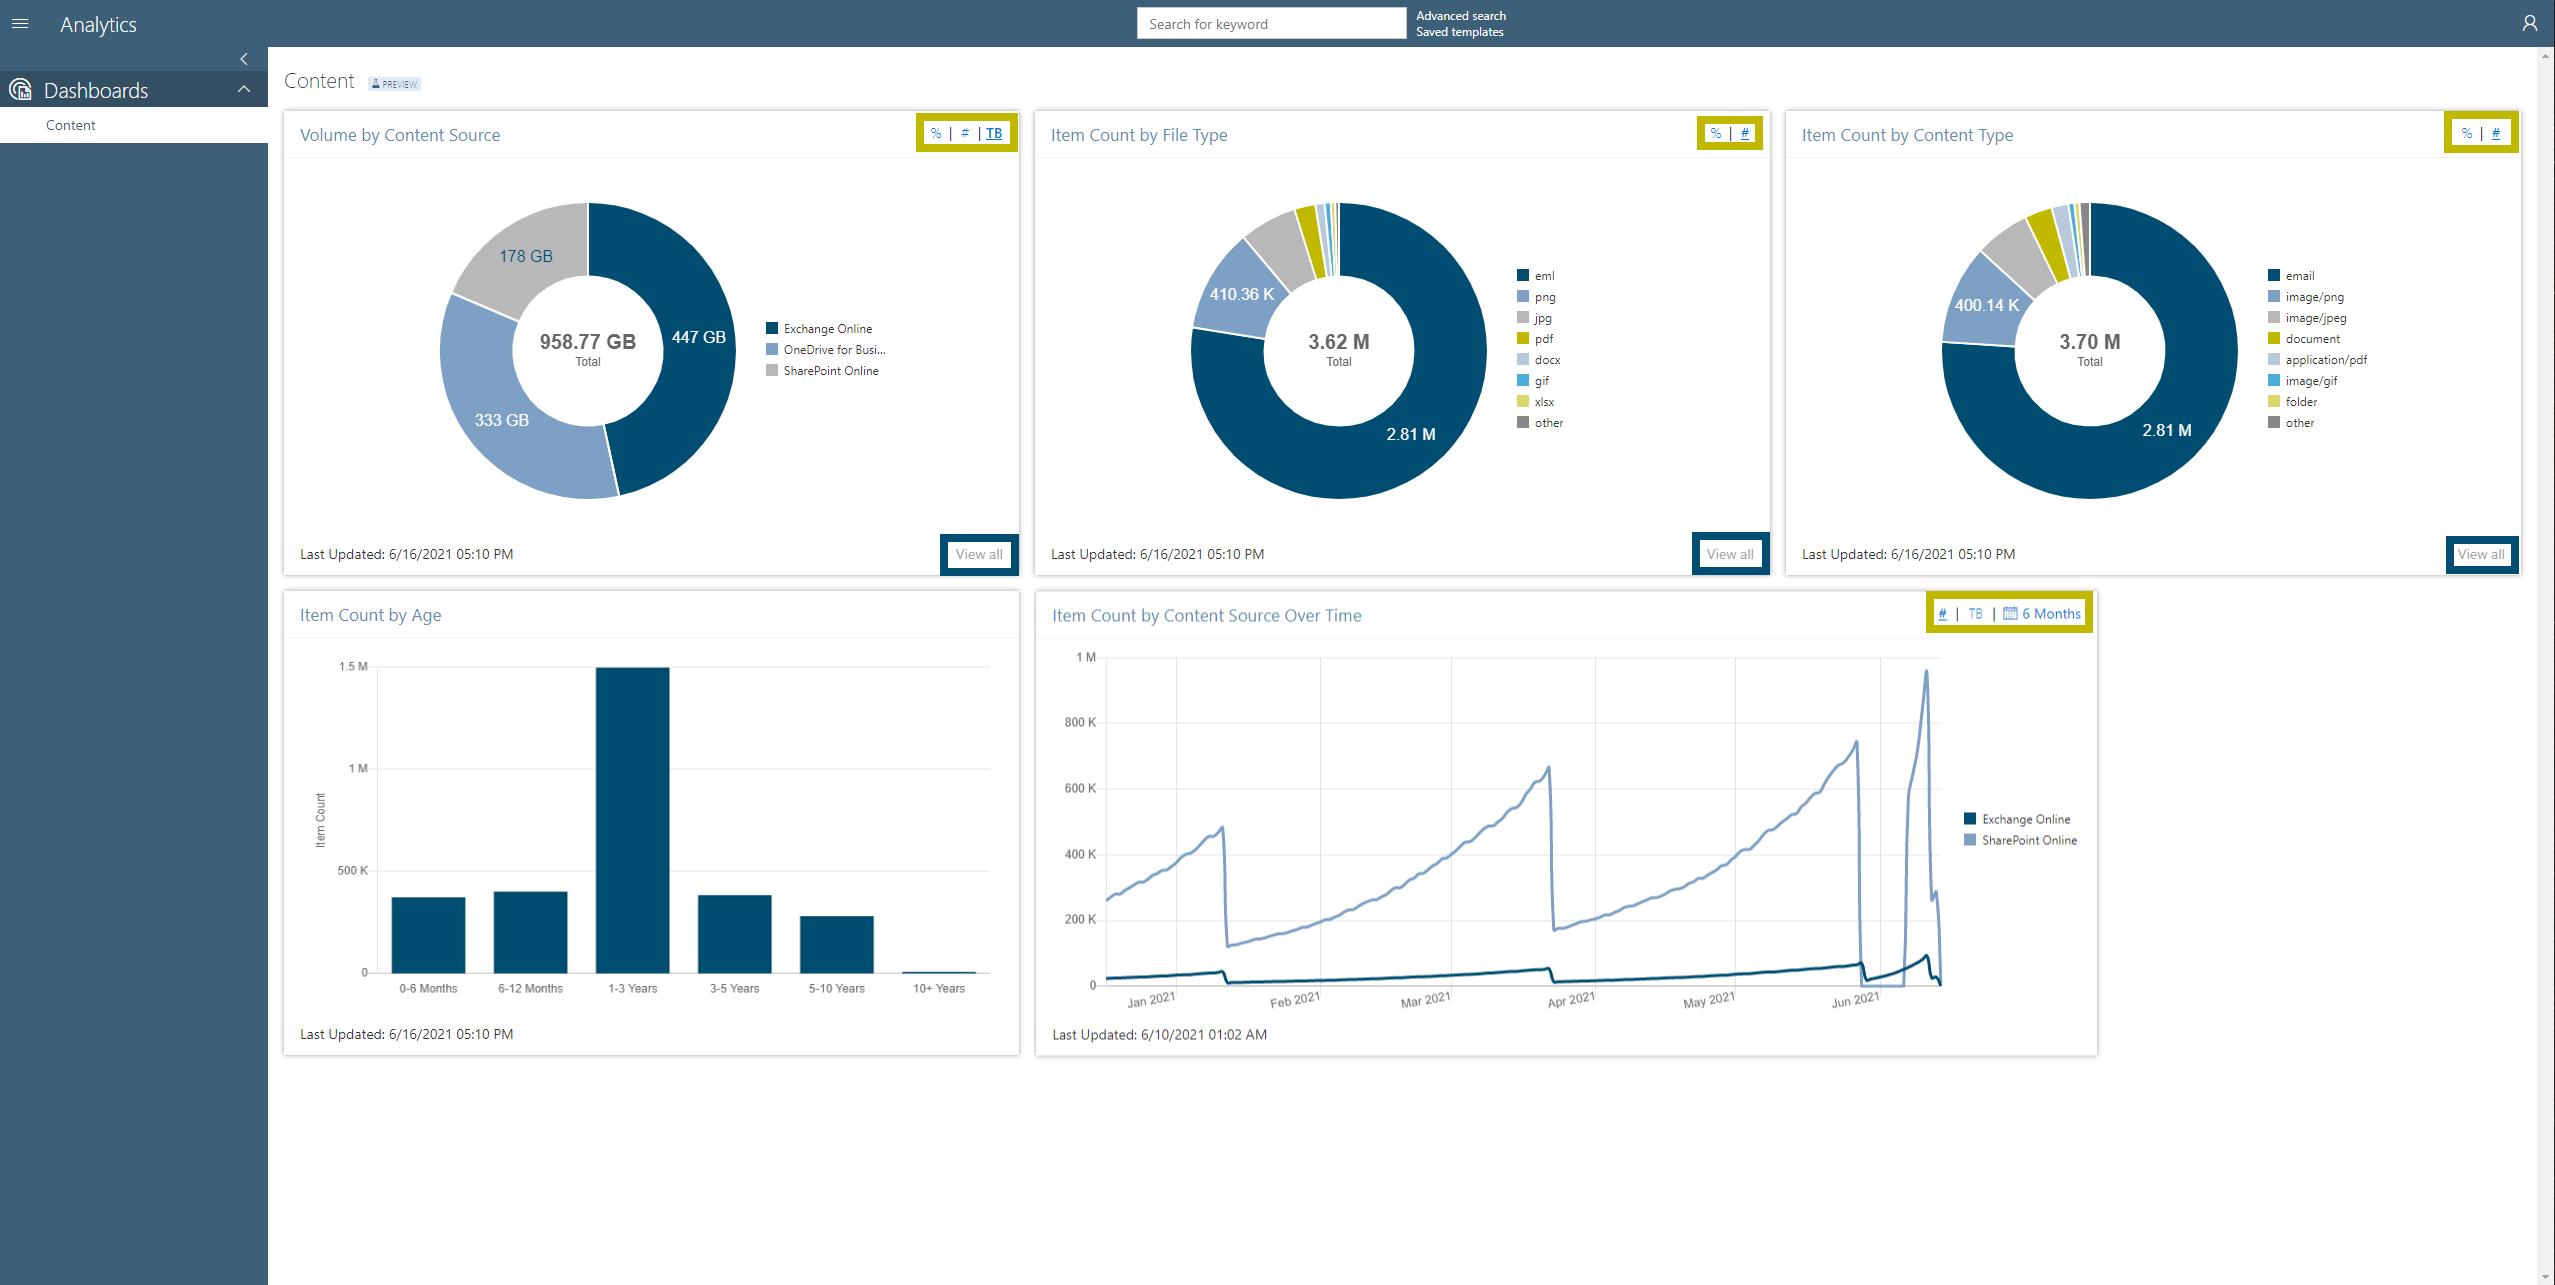 5 Analytics Features to Understand Organization-Wide Data at a Glance